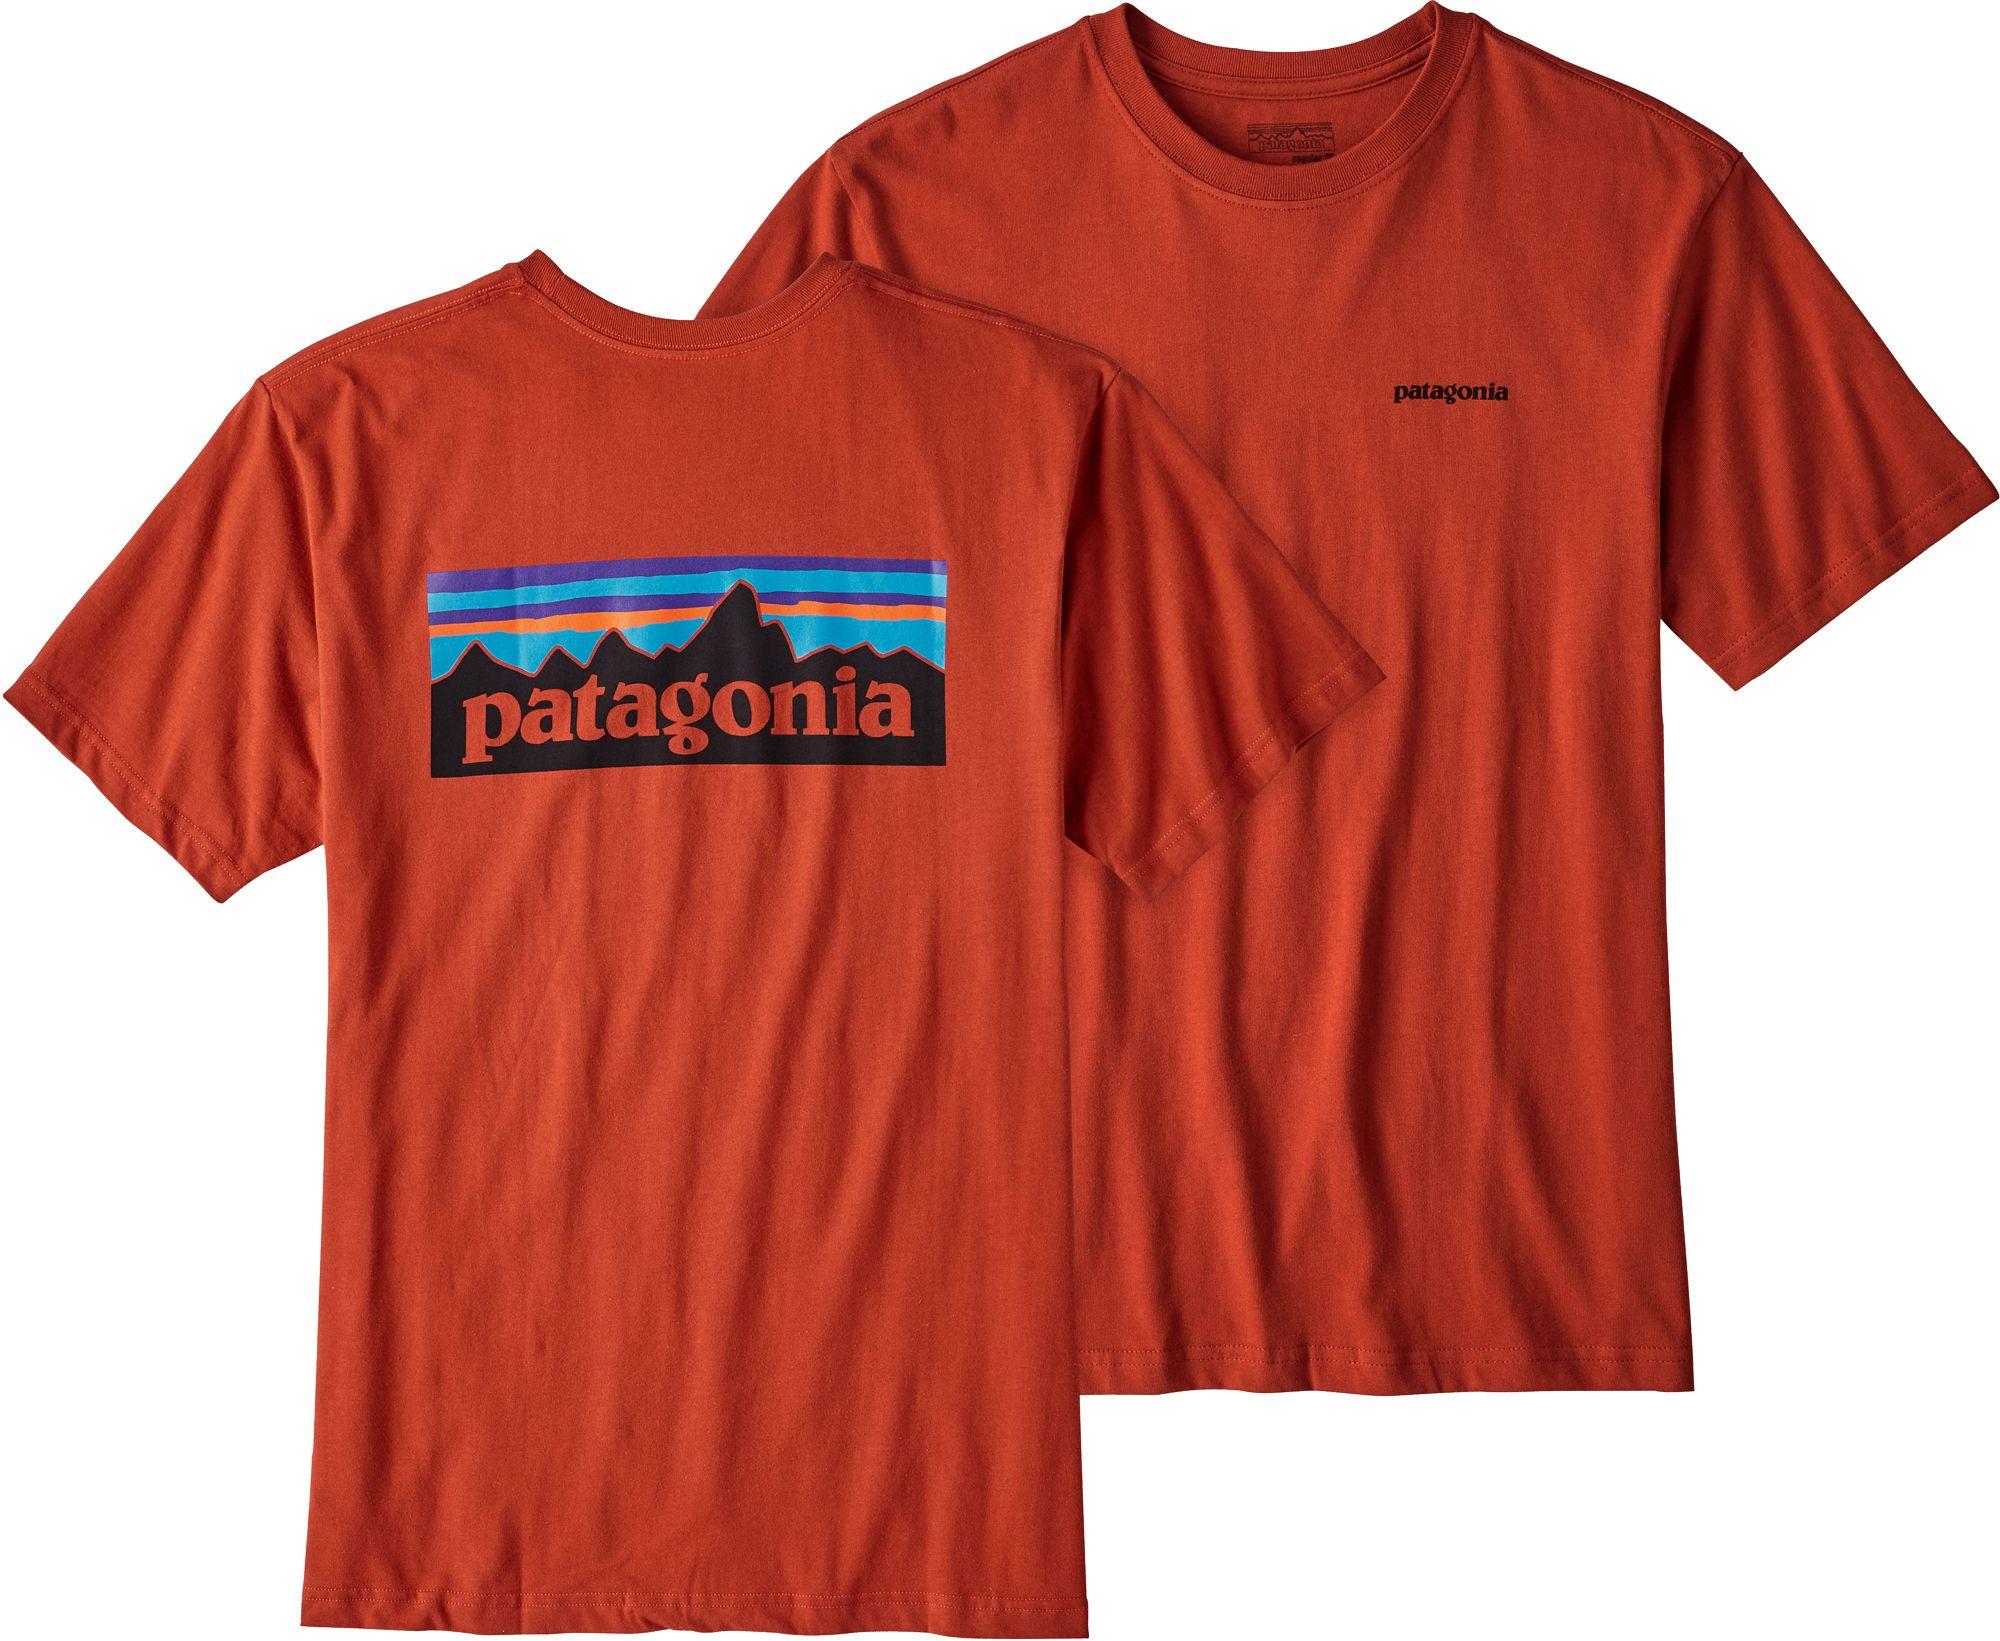 Favori Patagonia Men's P-6 Logo T-Shirt | DICK'S Sporting Goods ZX87